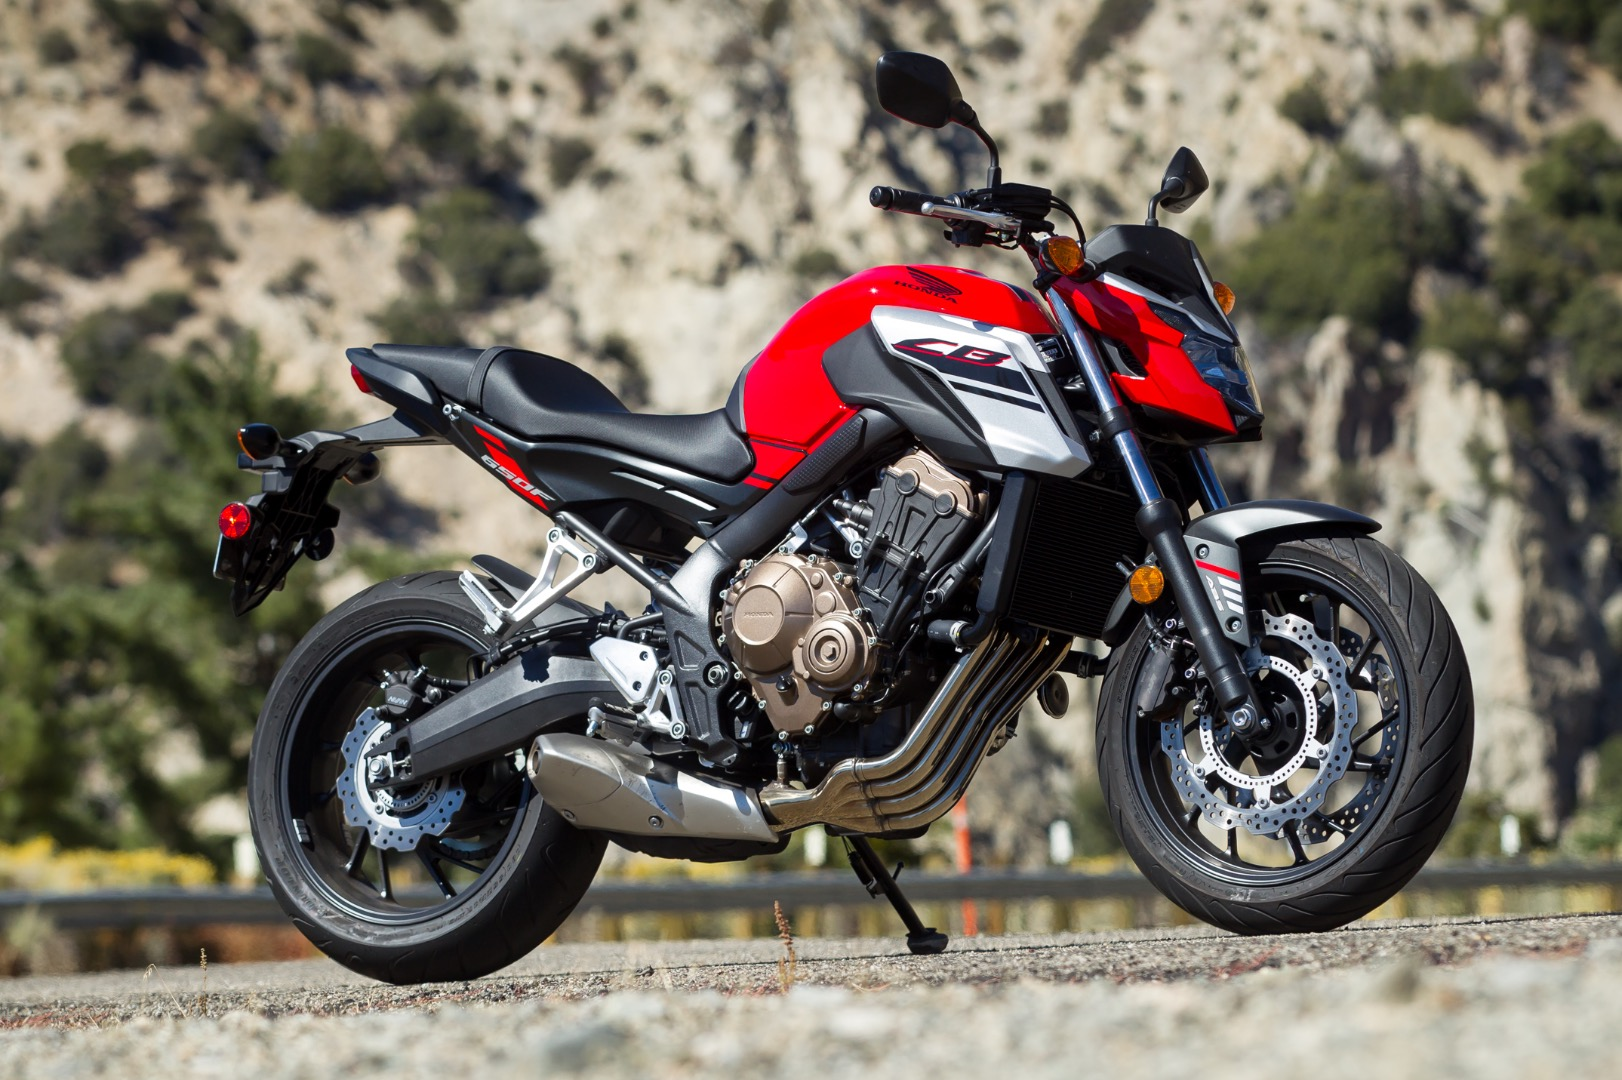 2018-Honda-CB650F-Review-Sport-Motorcycle-7.jpg